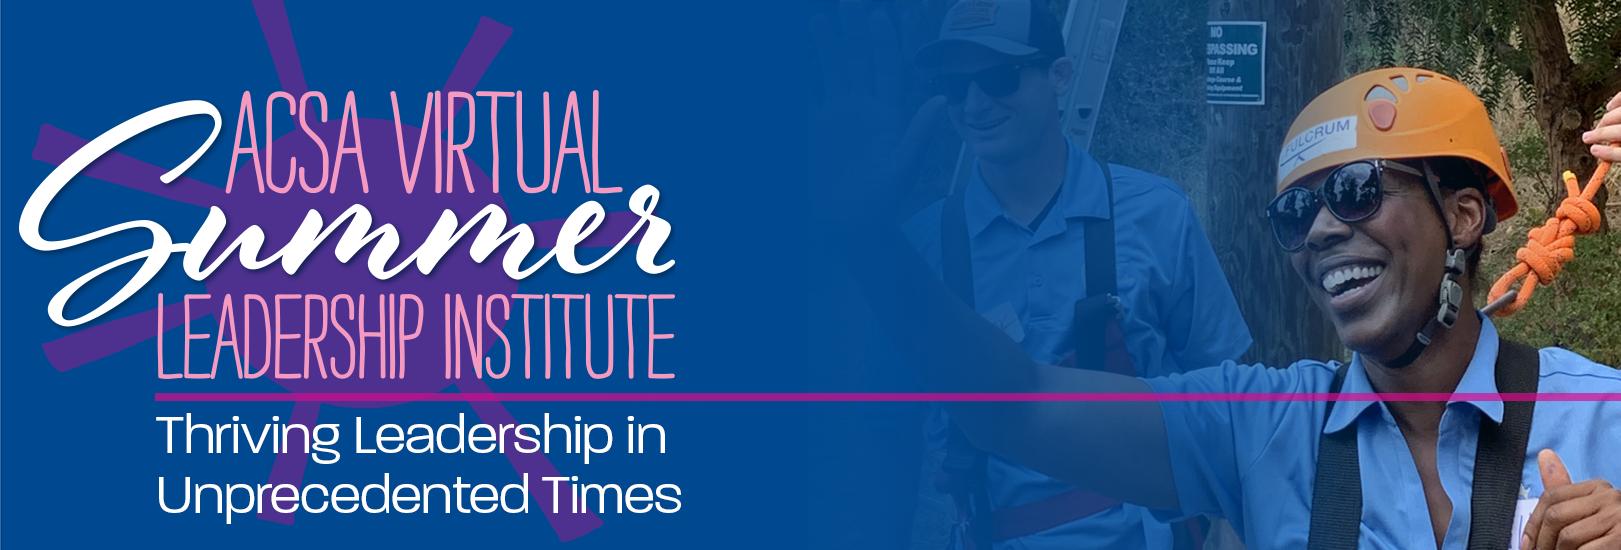 ACSA Virtual Summer Leadership Institute Image